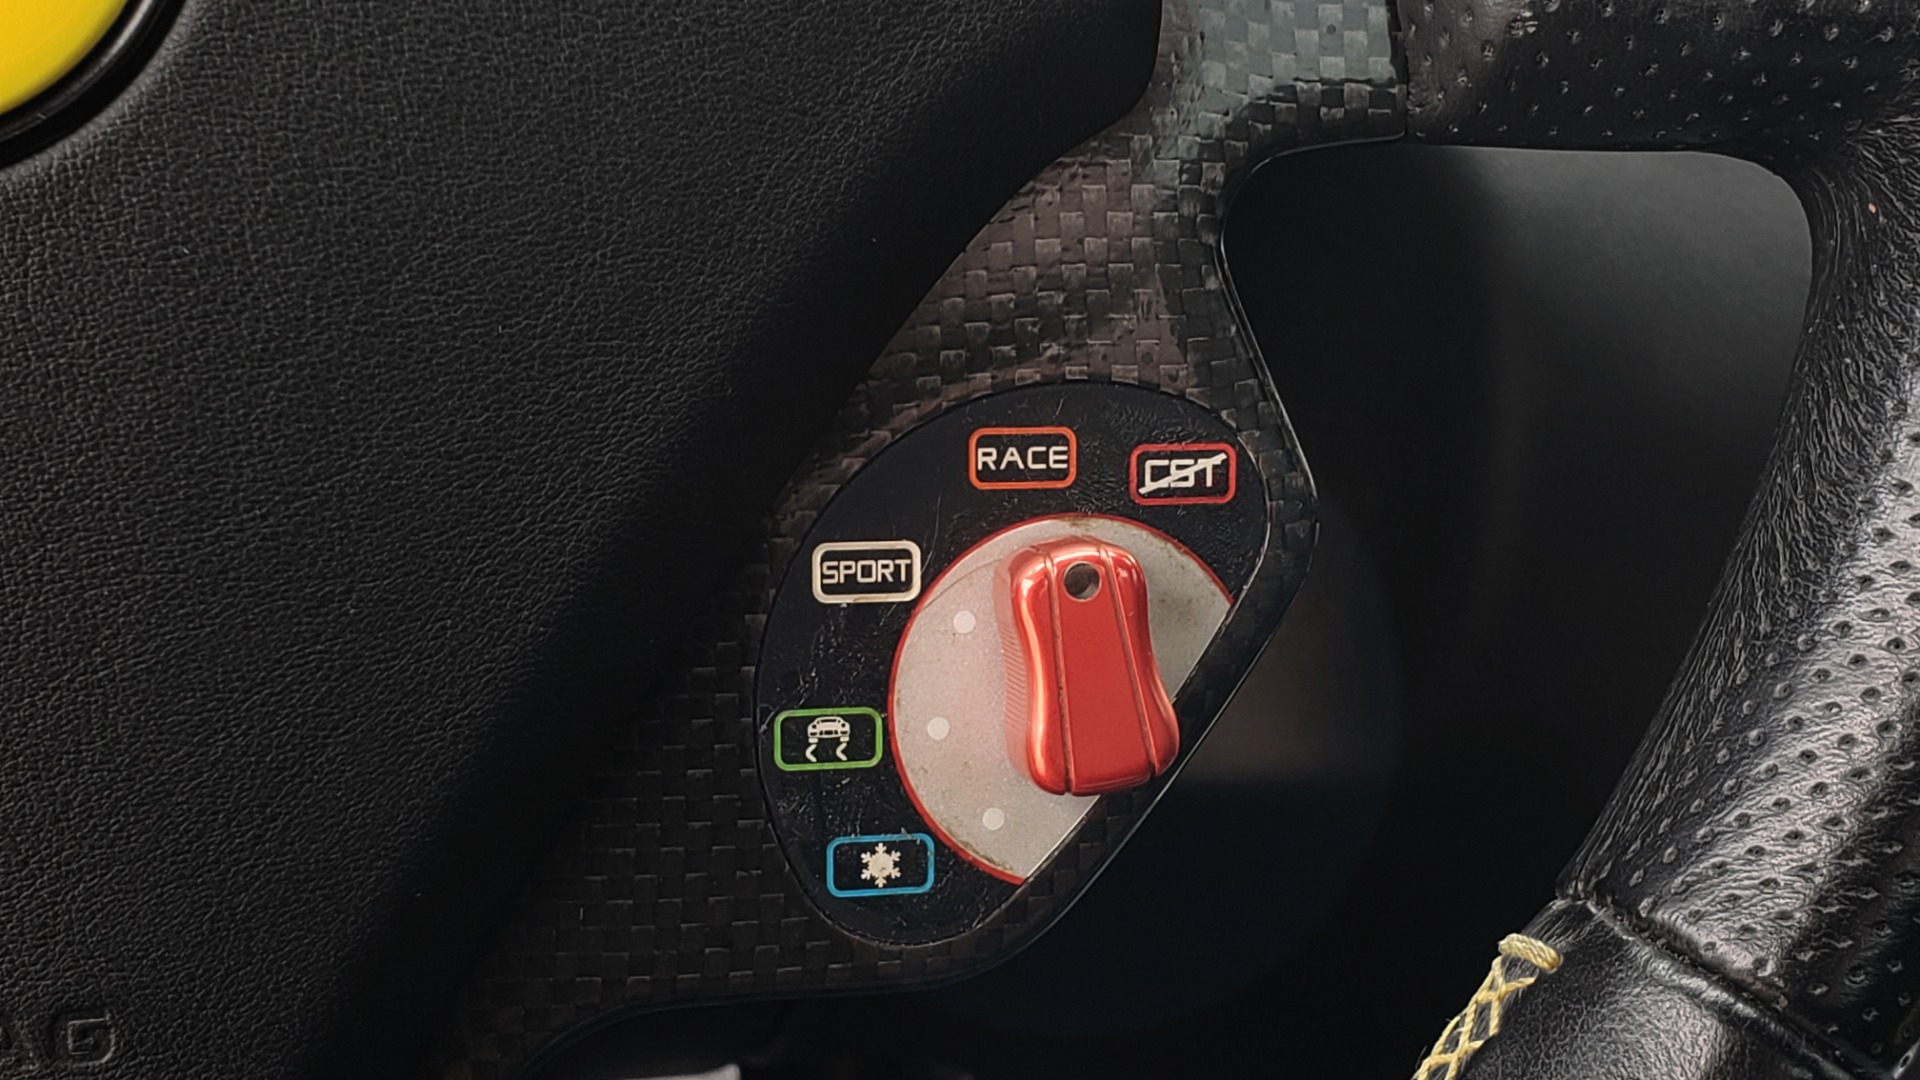 Used 2007 Ferrari 599 GTB FIORANO HGTE / V12 / F1 TRANS / NAV / BOSE / CUSTOM WHEELS for sale $109,999 at Formula Imports in Charlotte NC 28227 26